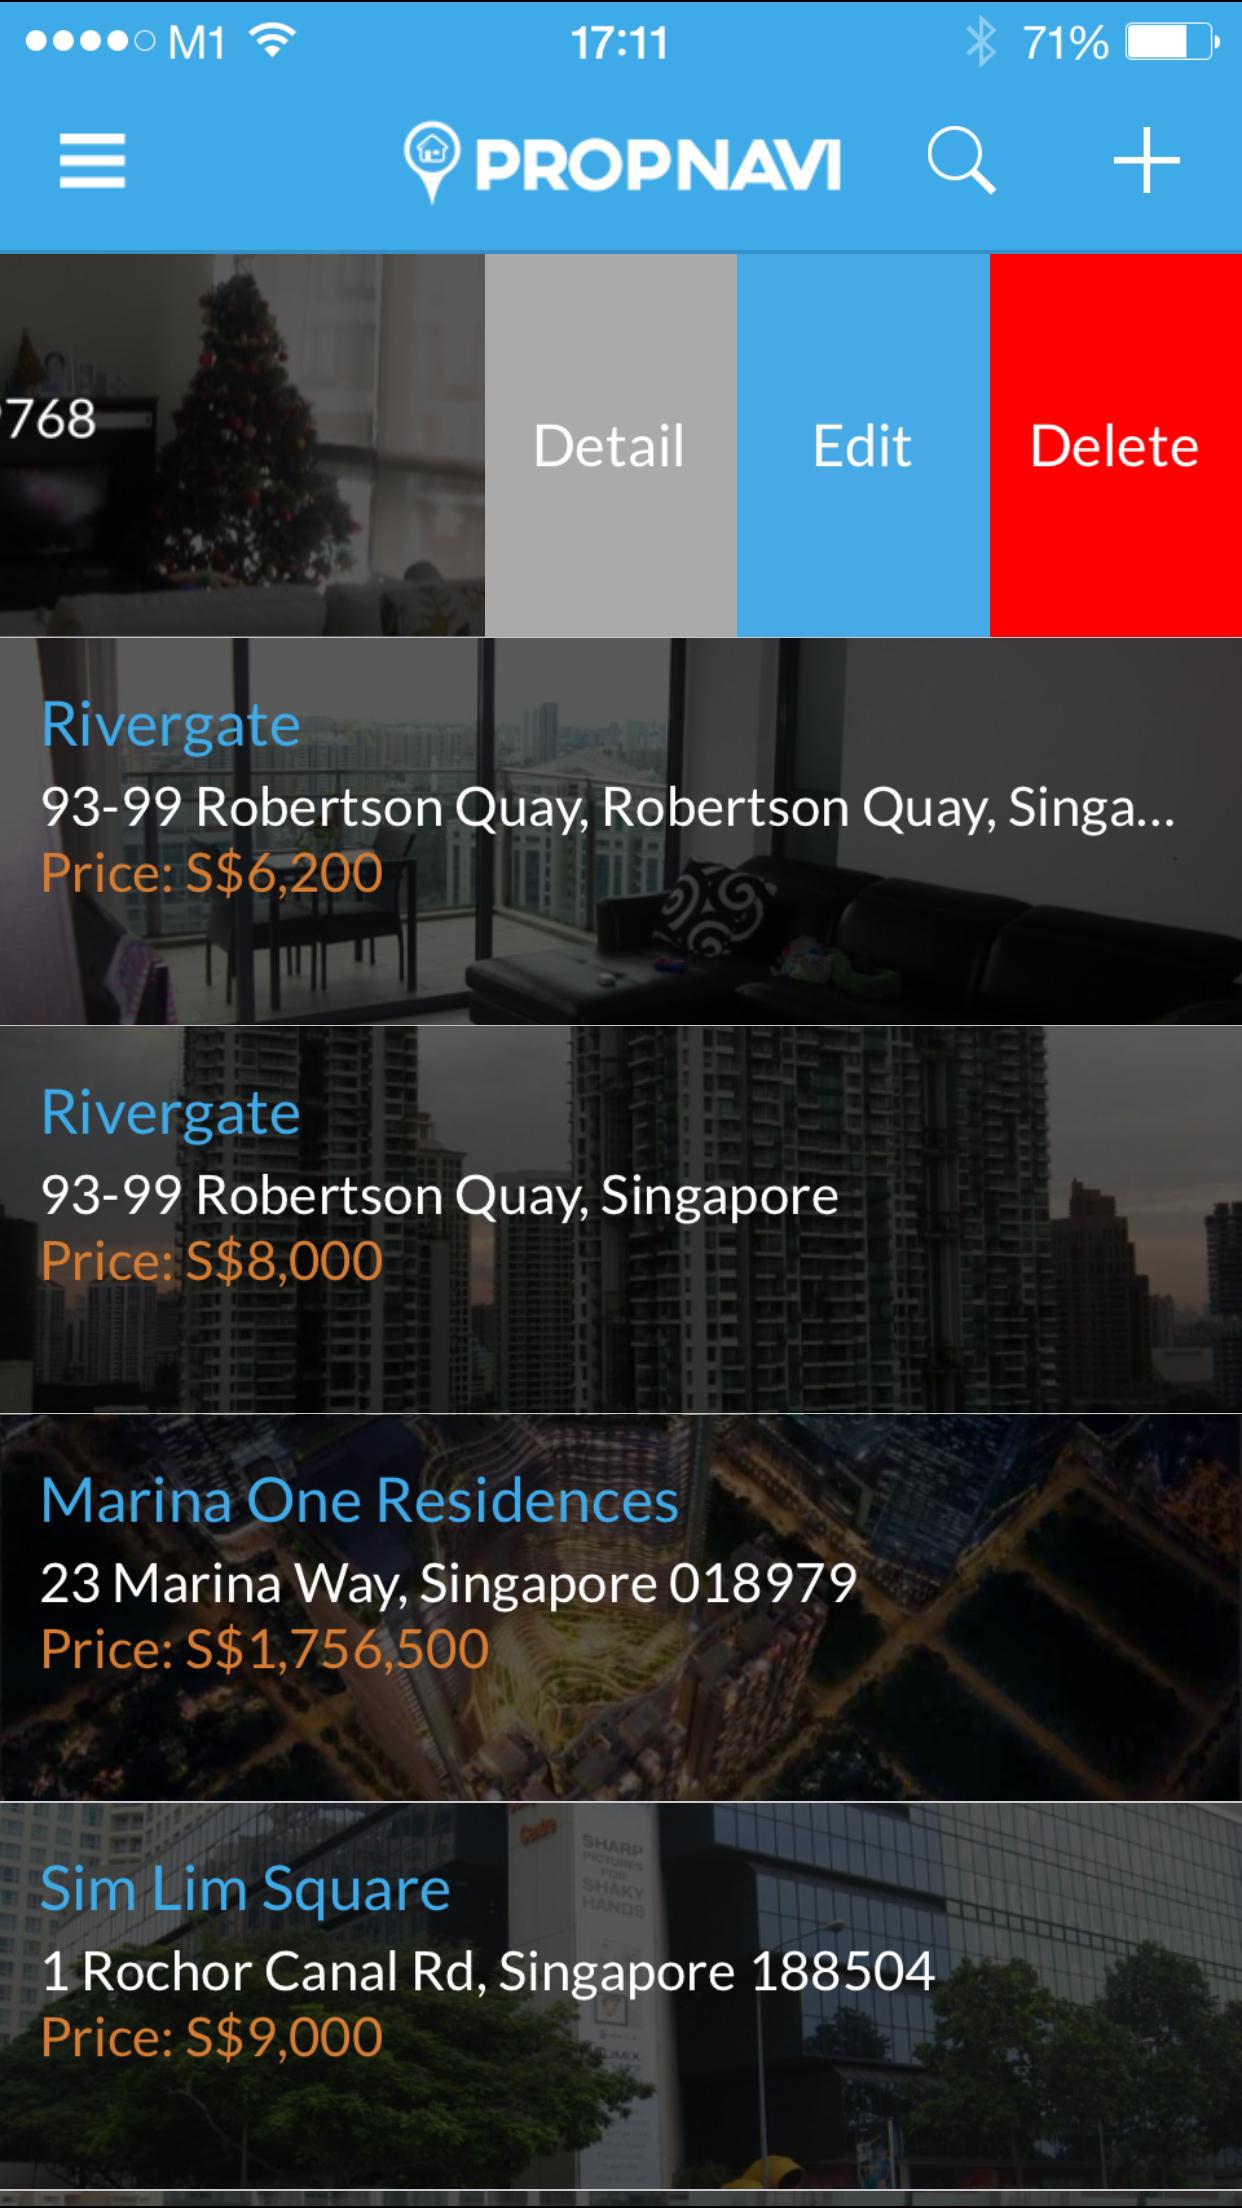 Propnavi Property Agent listing Edit Call Keith Tan to